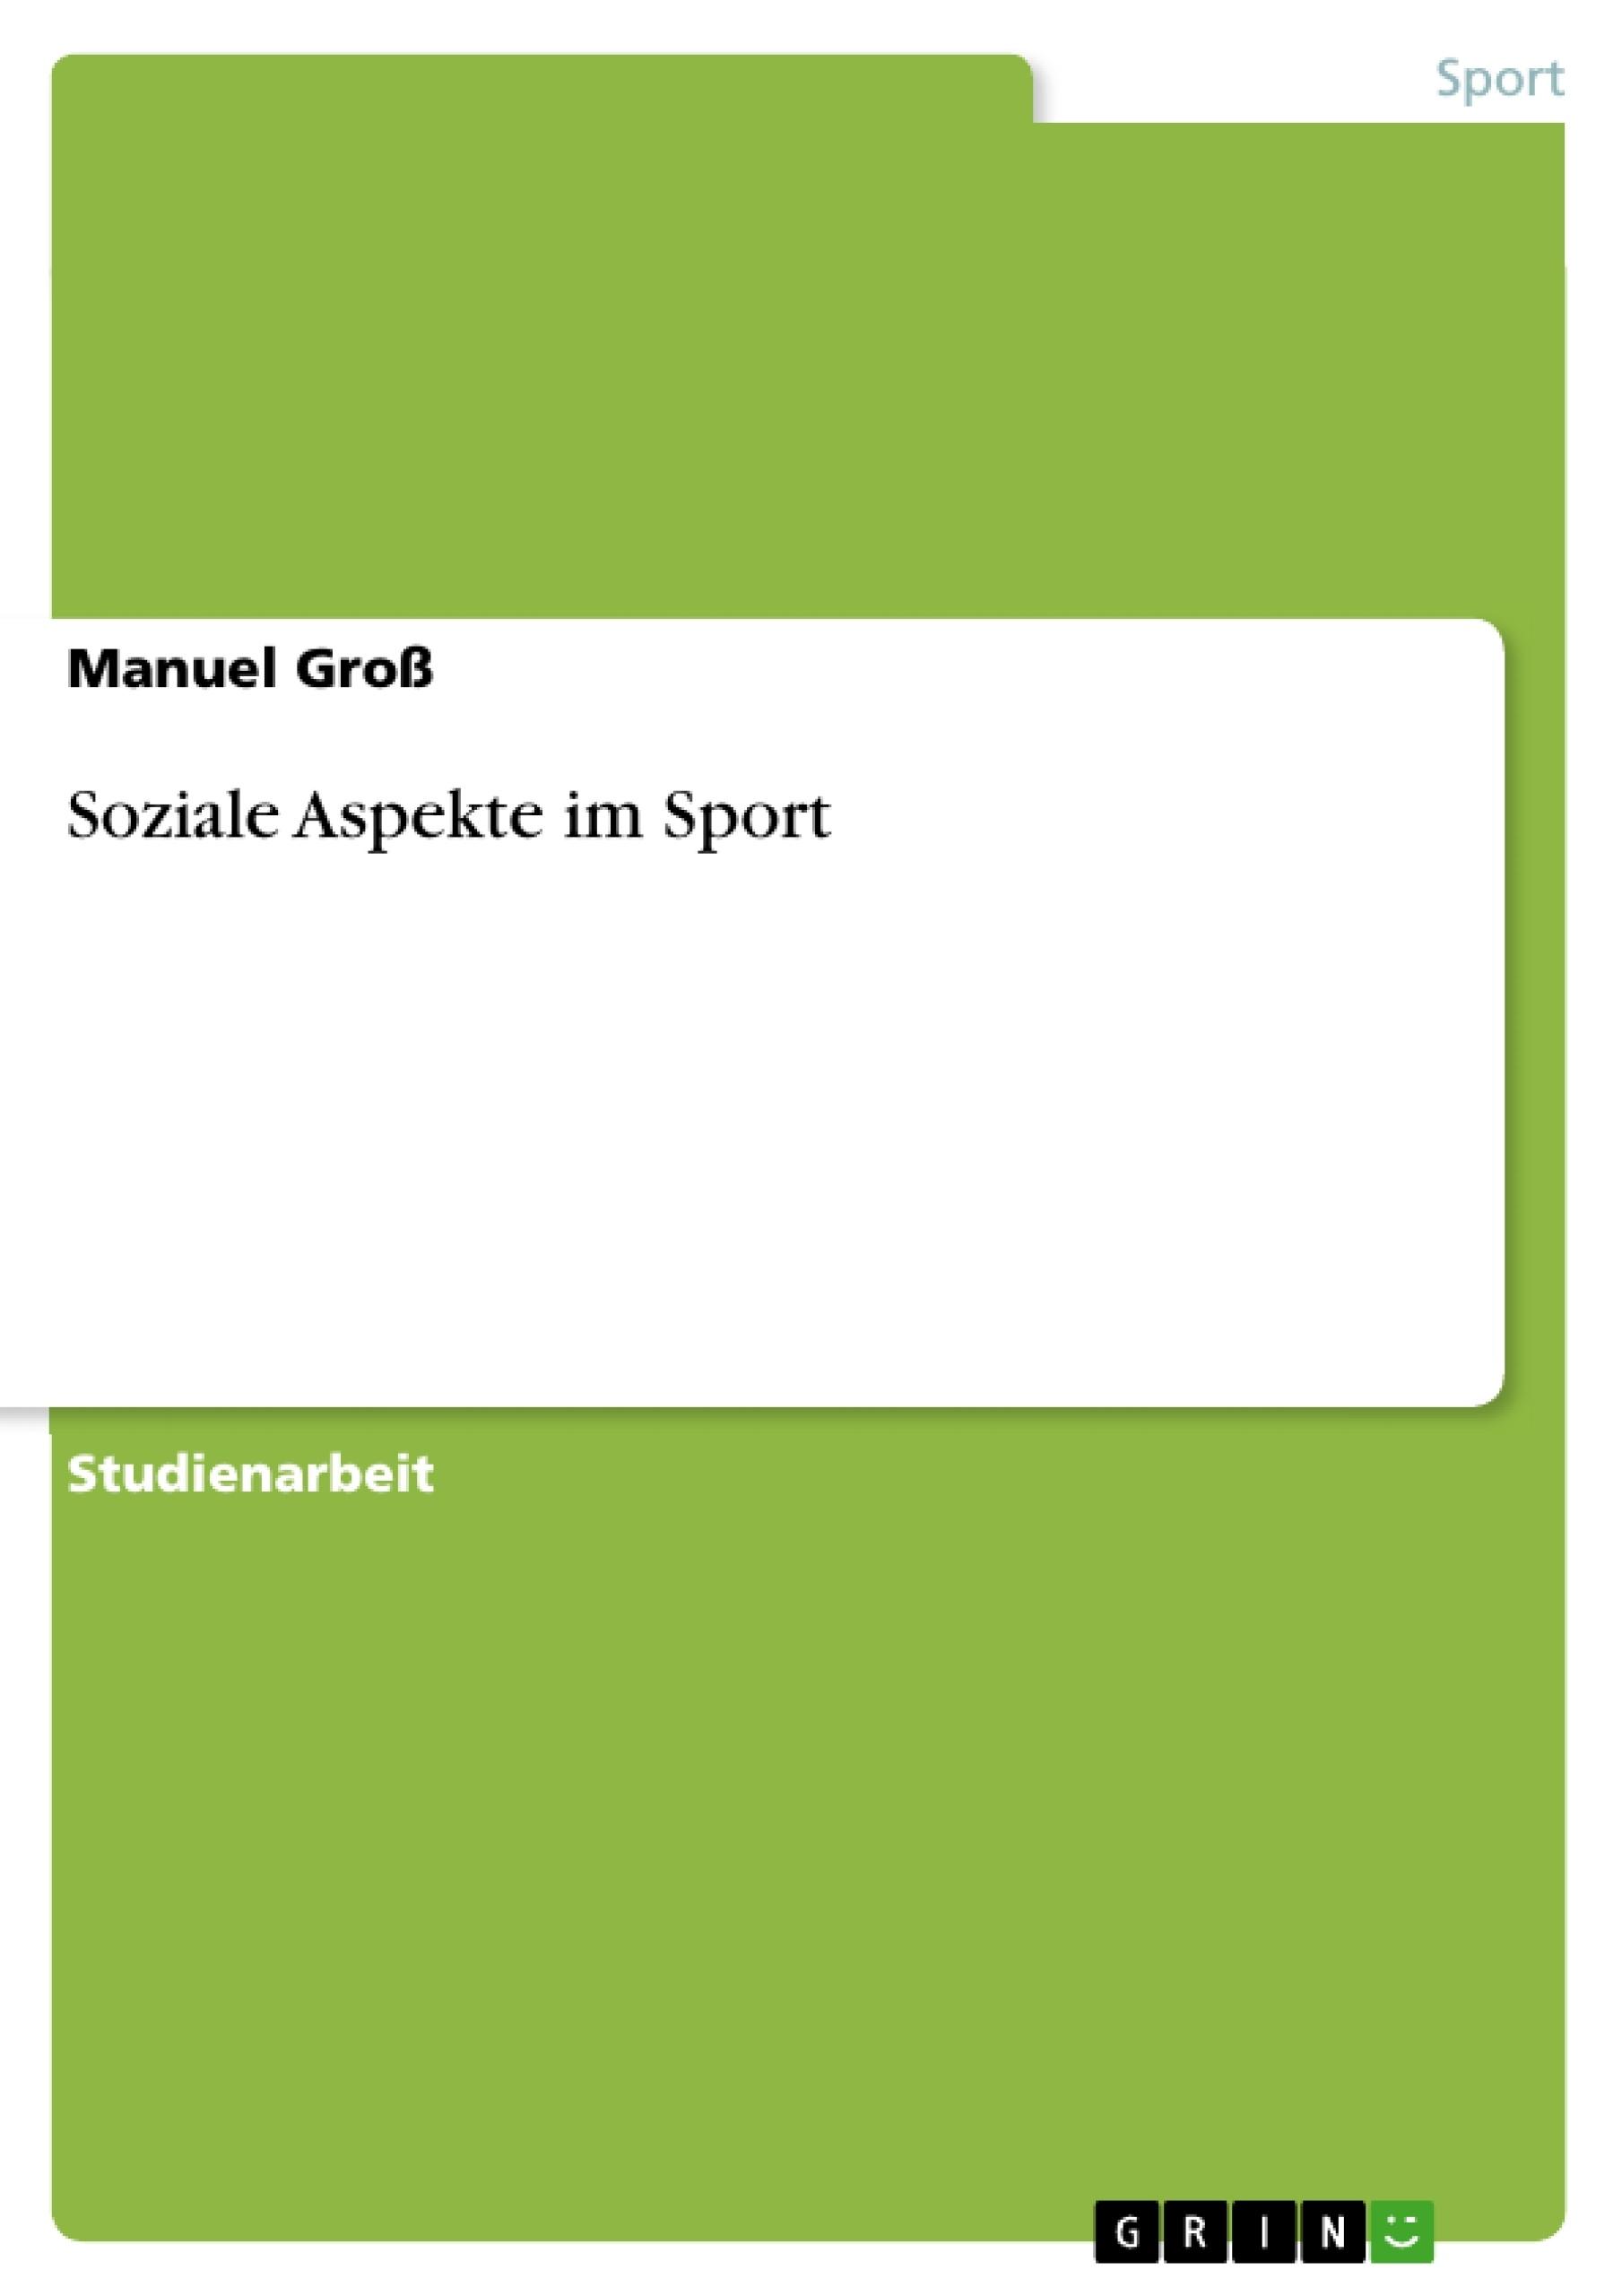 Titel: Soziale Aspekte im Sport